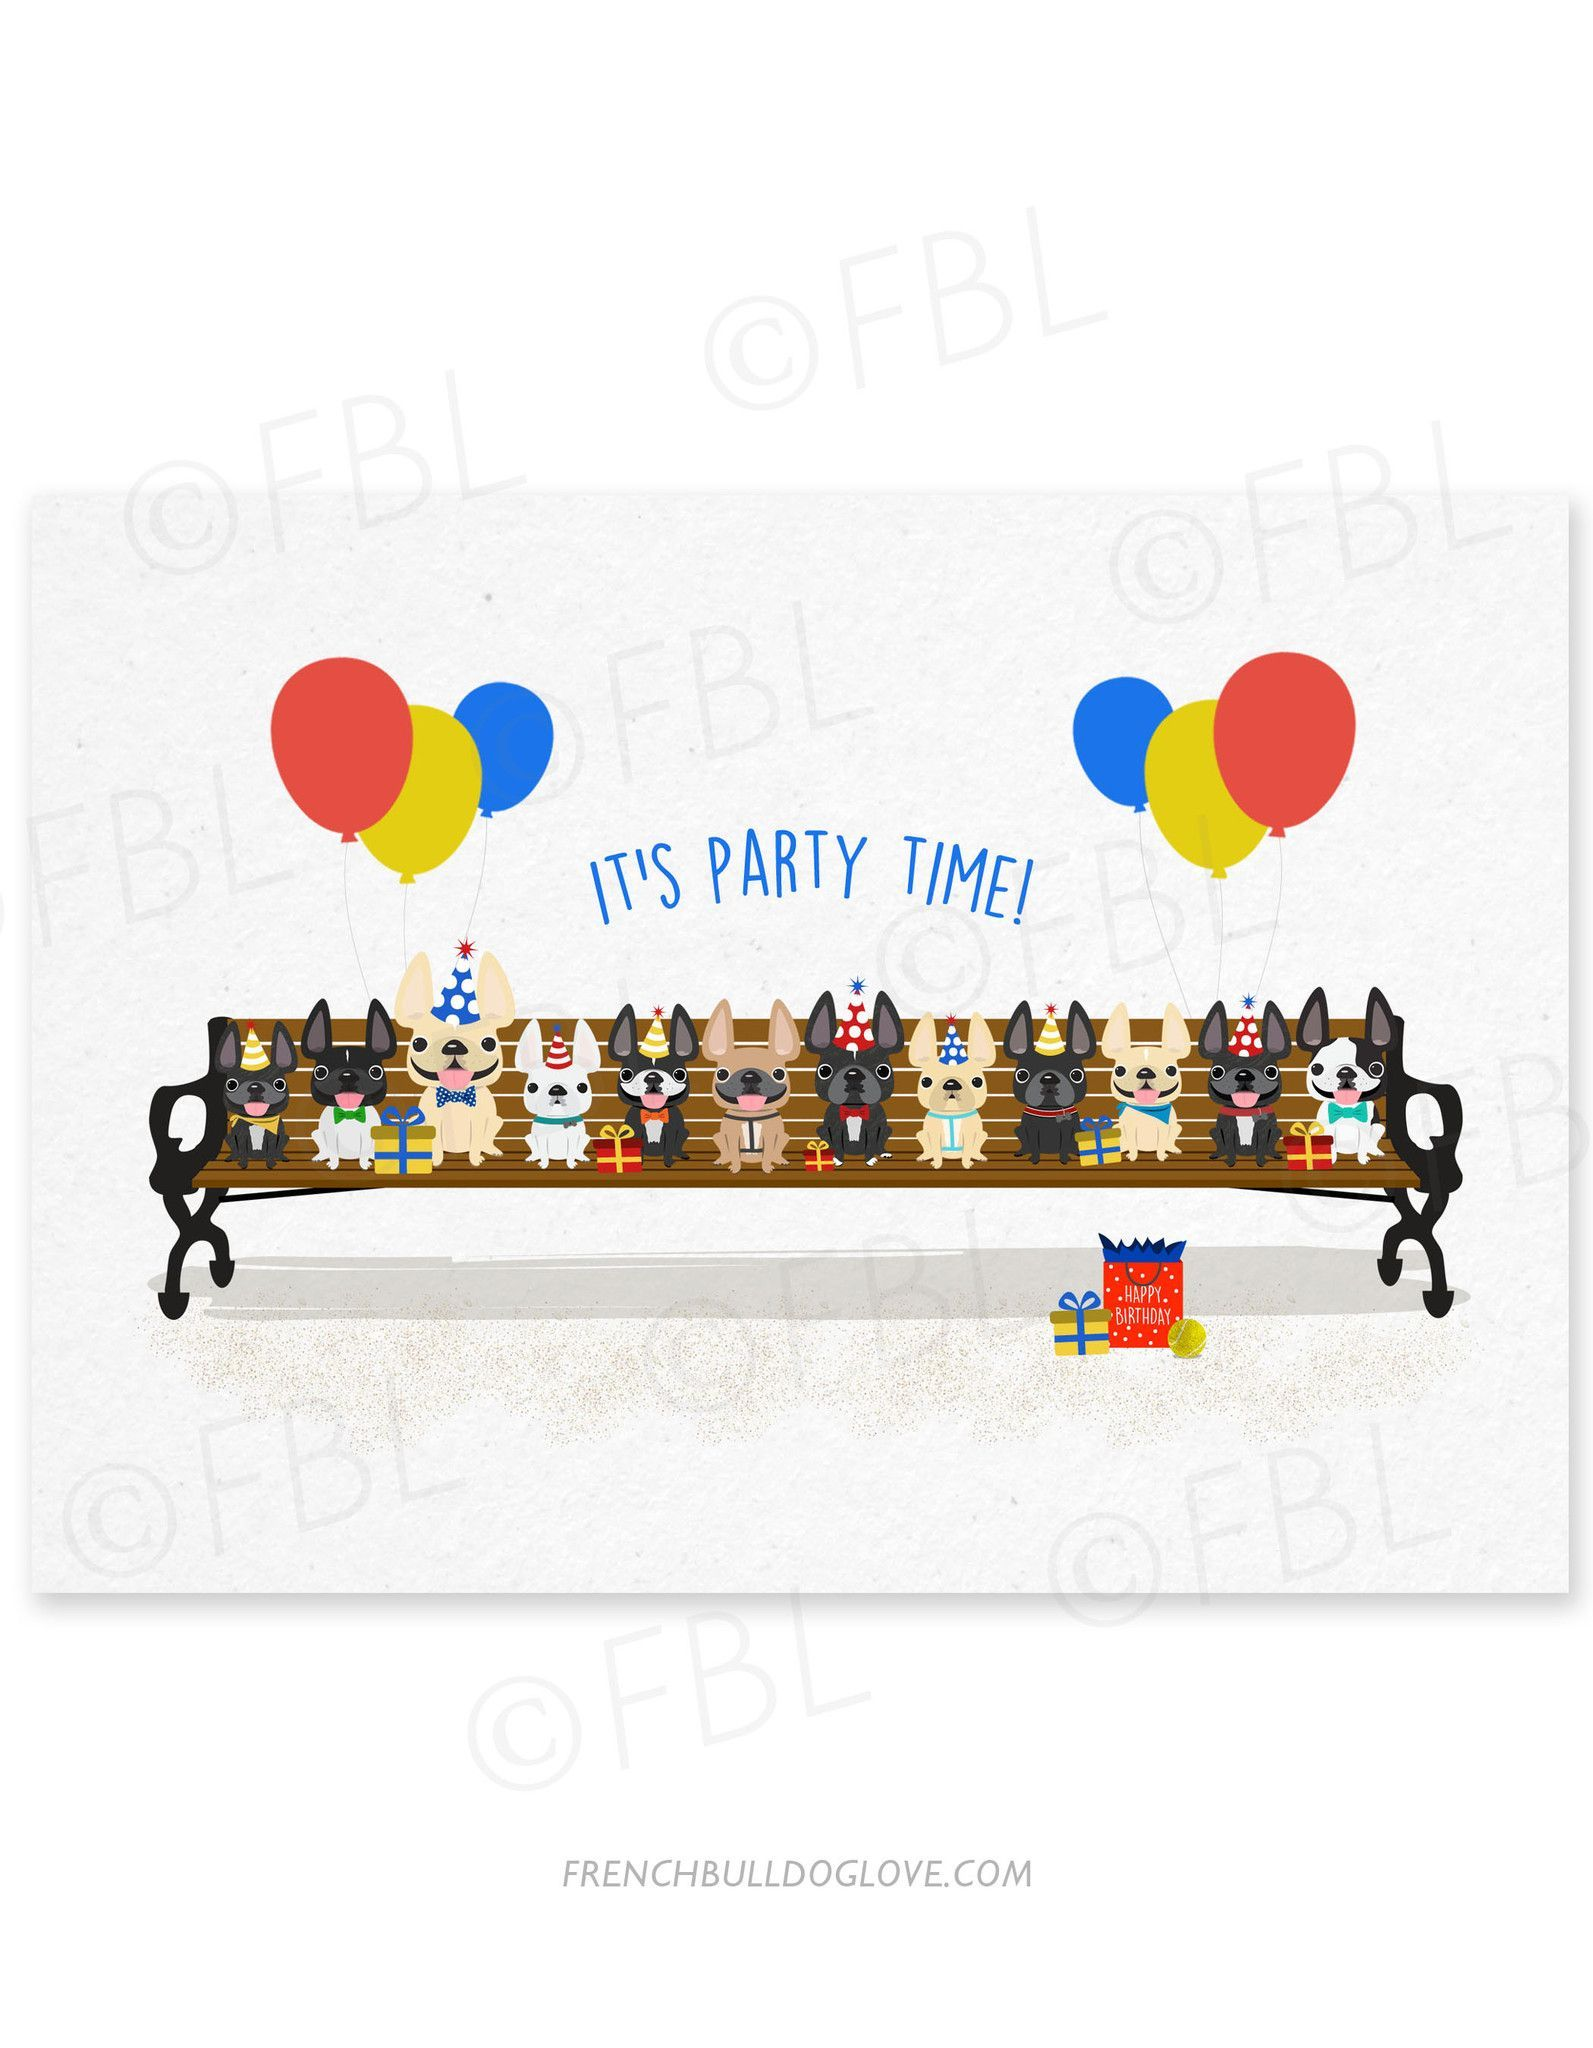 Puppy Party French Bulldog Birthday Card Puppy Party Birthday Cards Dog Greeting Cards